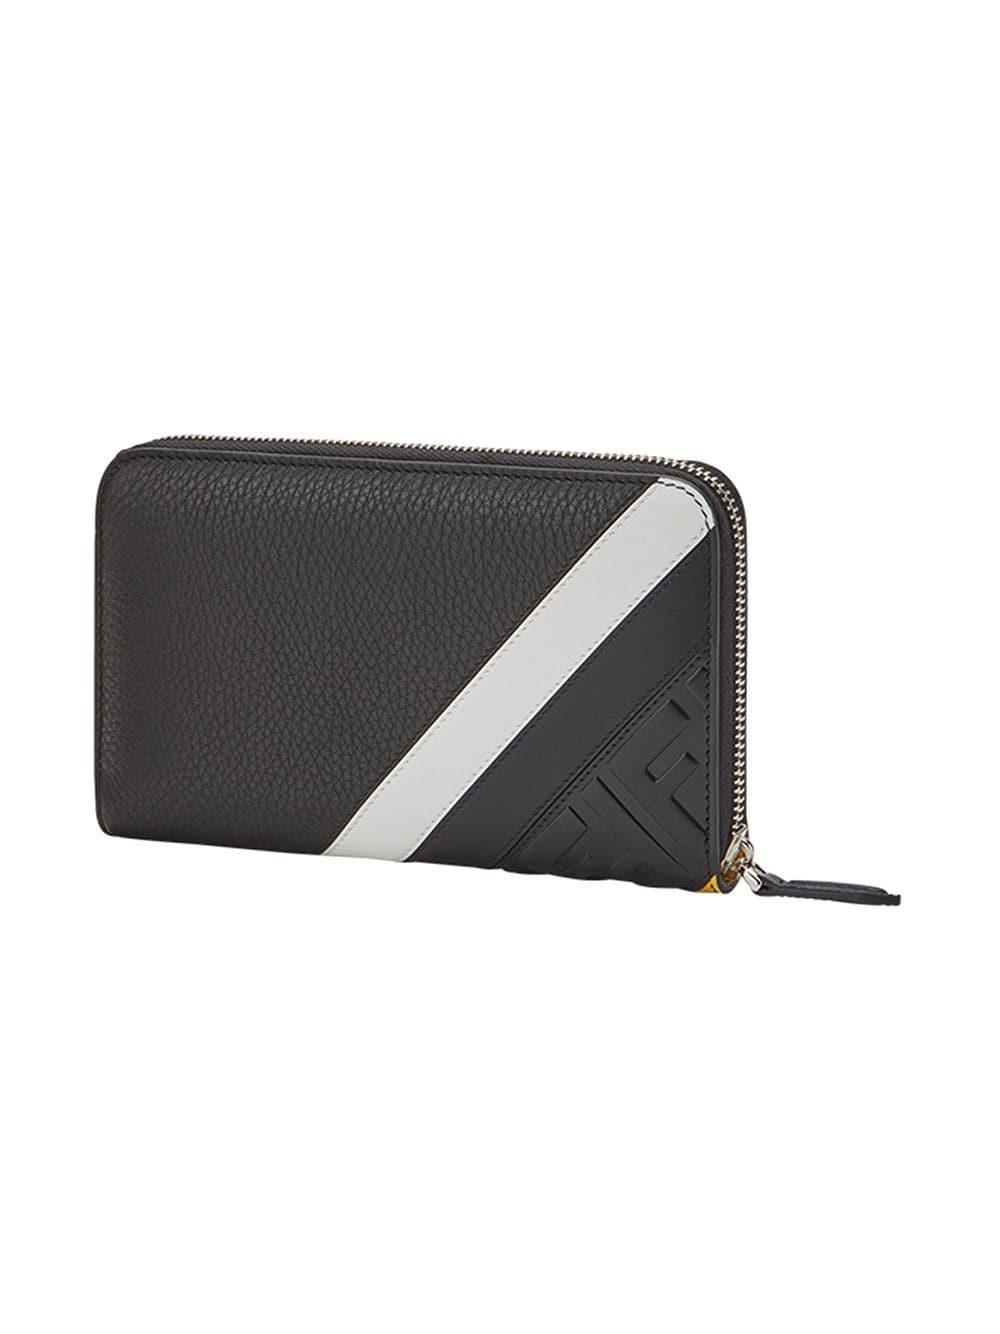 8800355ddca Fendi Debossed Ff Logo Wallet in Black for Men - Lyst